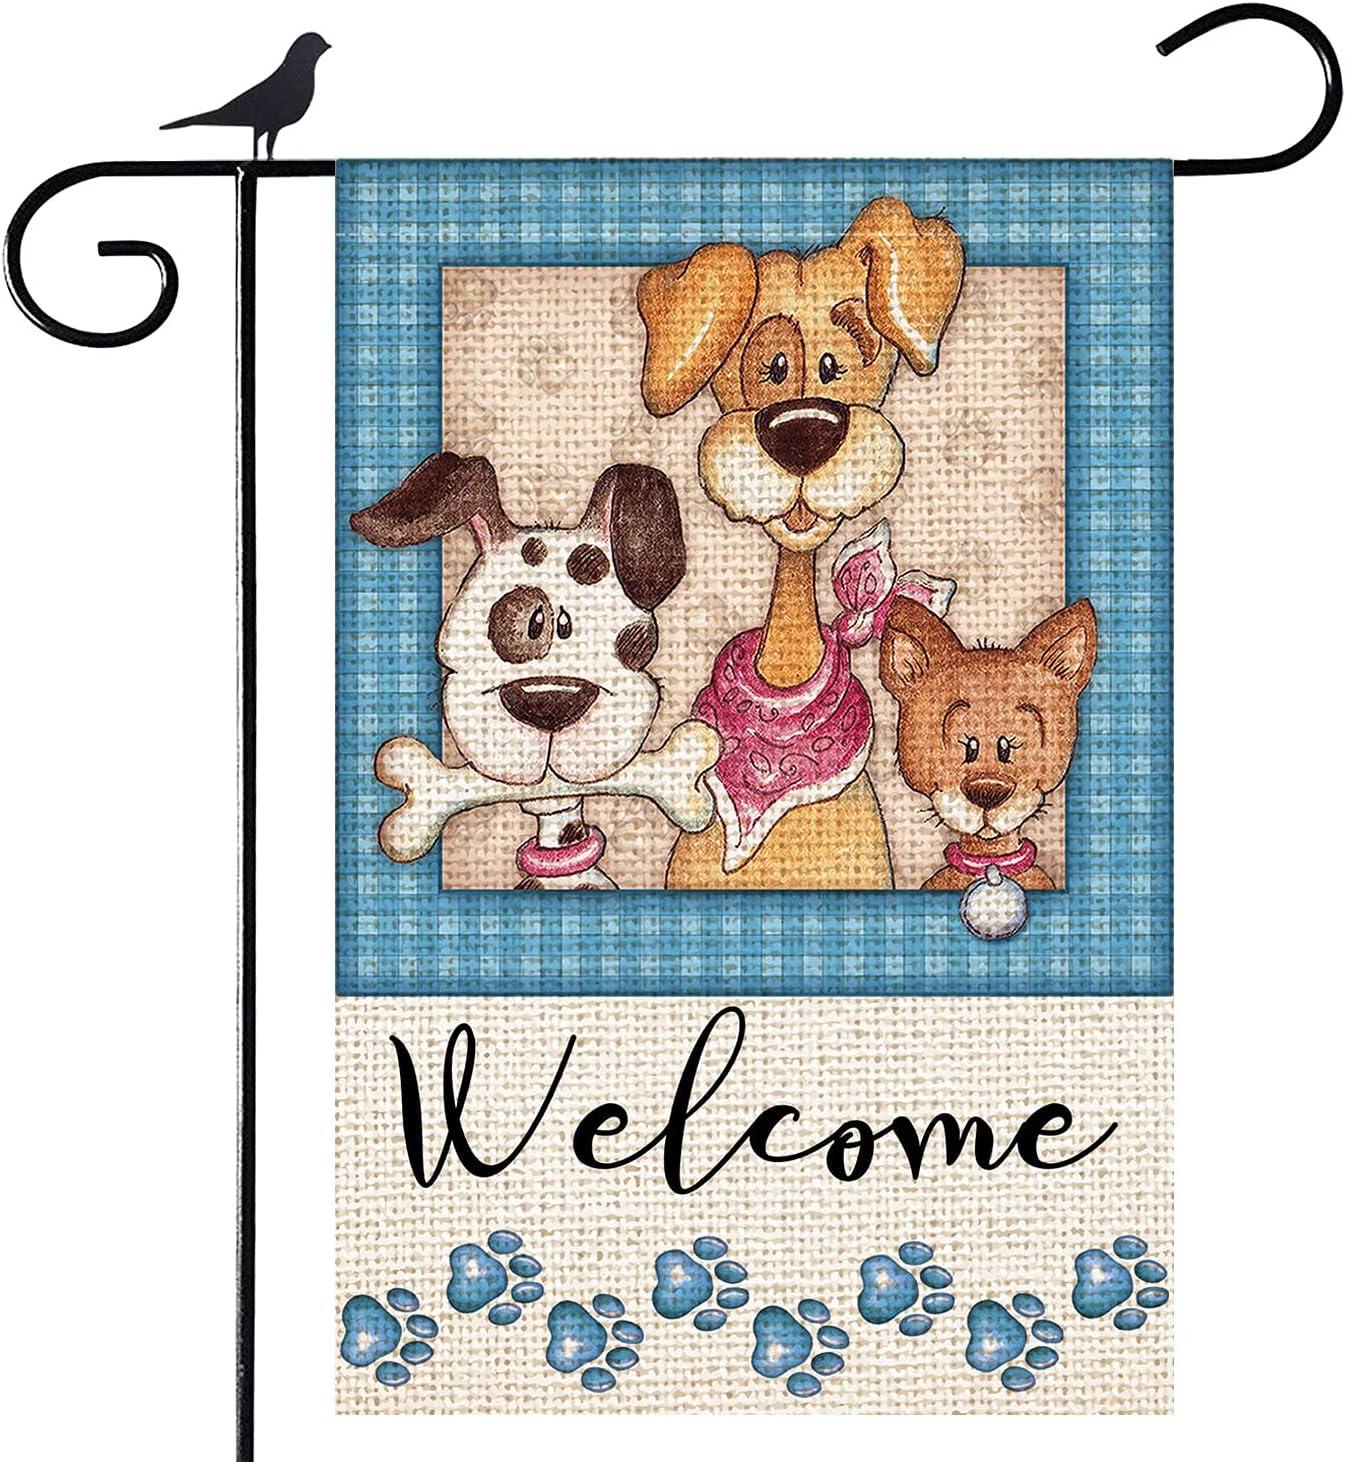 Shmbada Welcome Dogs Puppy Paw Print Burlap Garden Flag, Double Sided Vertical Outdoor Spring Summer Decorative Small Flag for Home Garden Yard Patio Farmhouse, 12 x 18 Inch